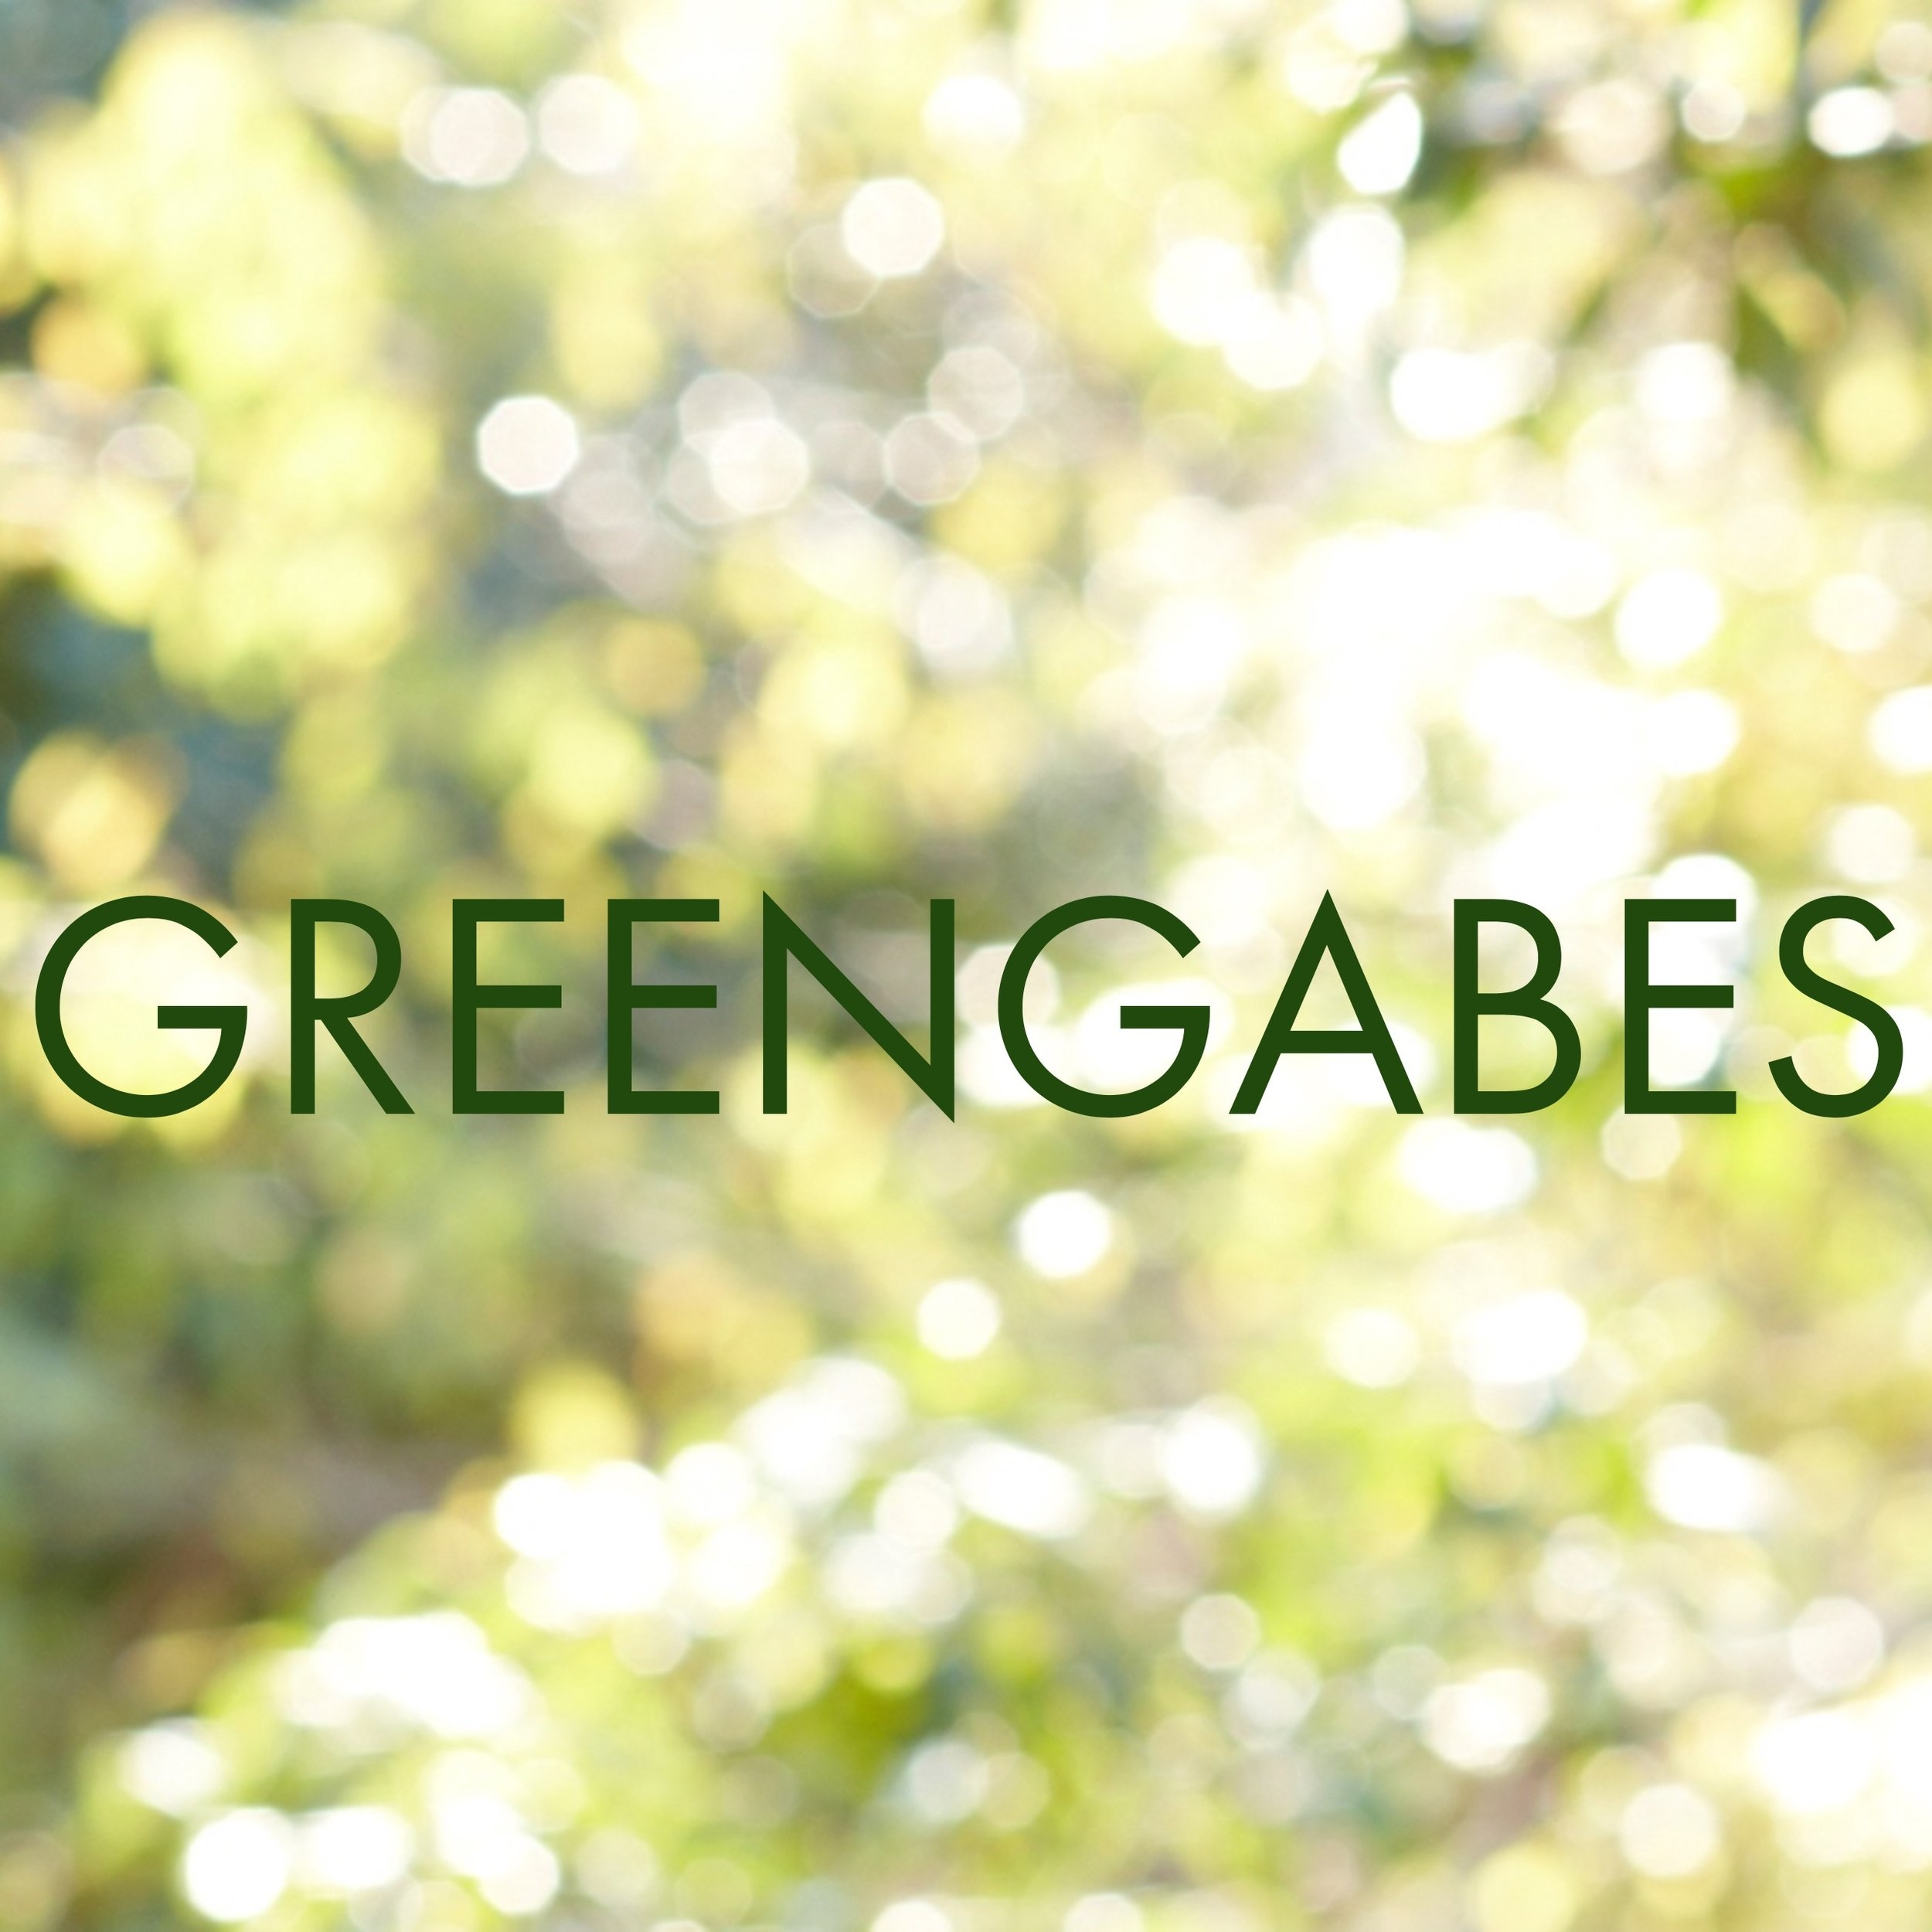 Greengabes:500kb.jpg